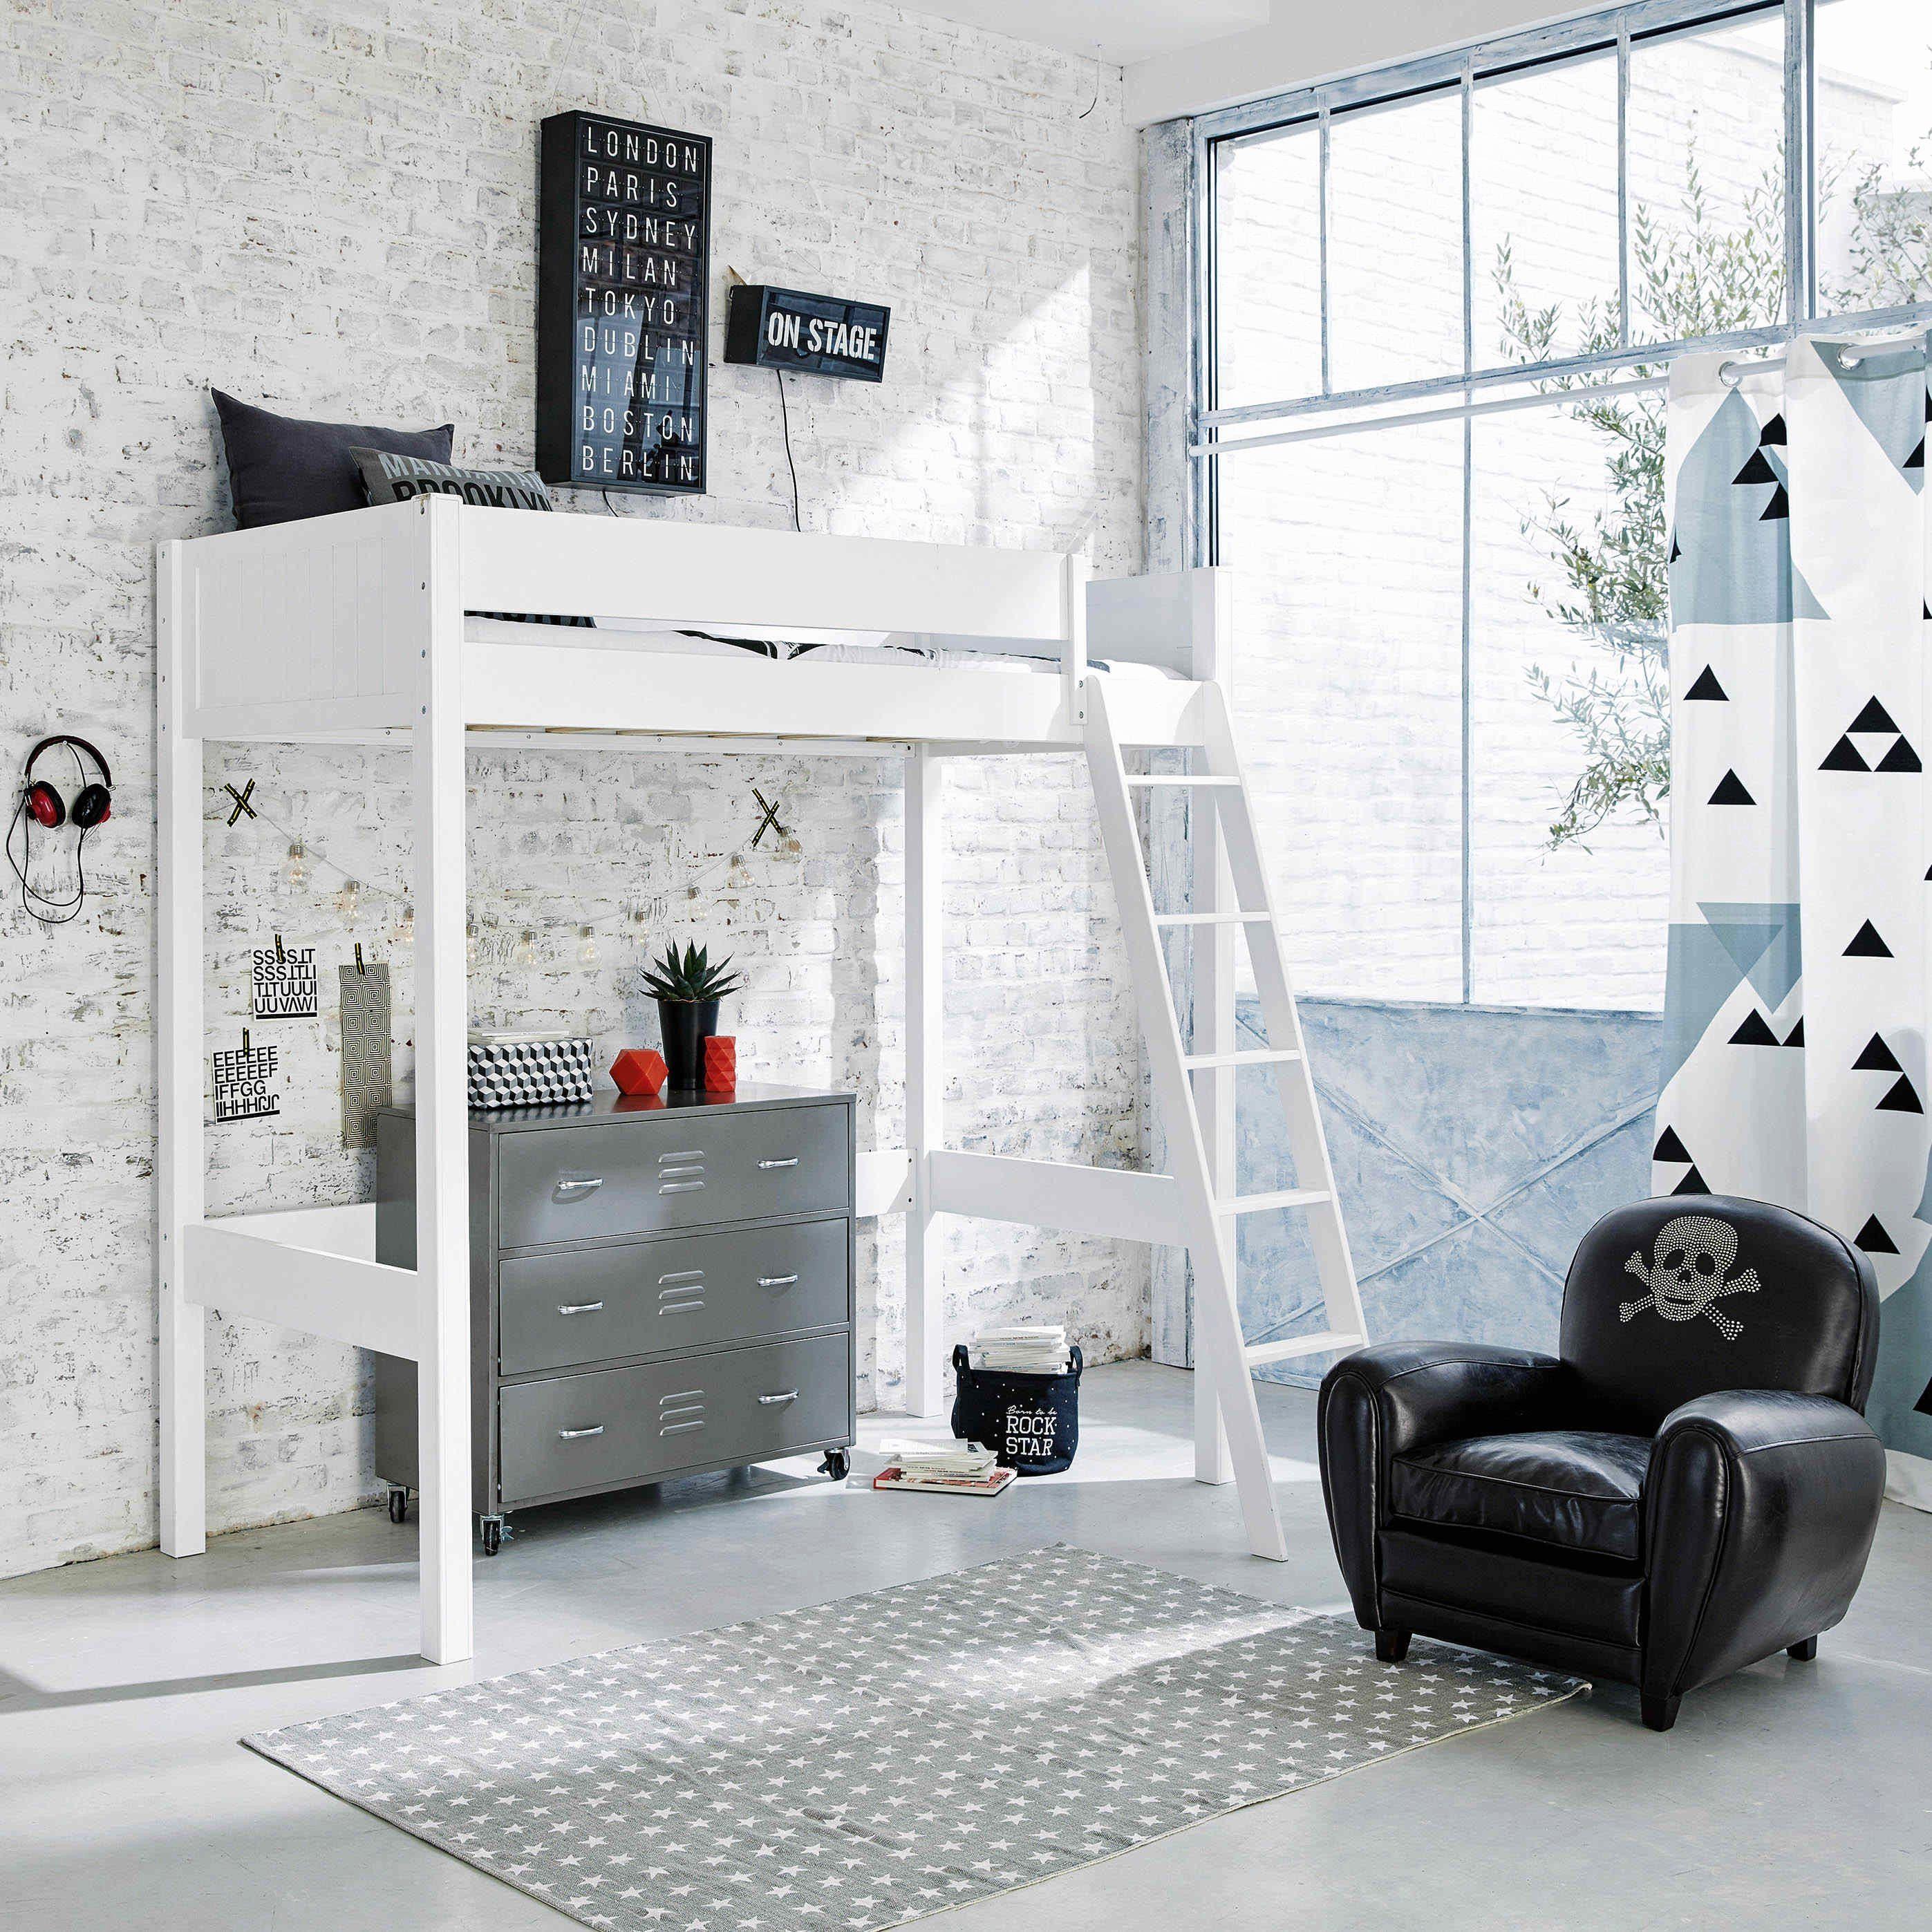 Lit Mezzanine Adulte 160×200 Belle Lit Mezzanine Adulte 160—200 Inspiré 47 Présente Lit Mezzanine